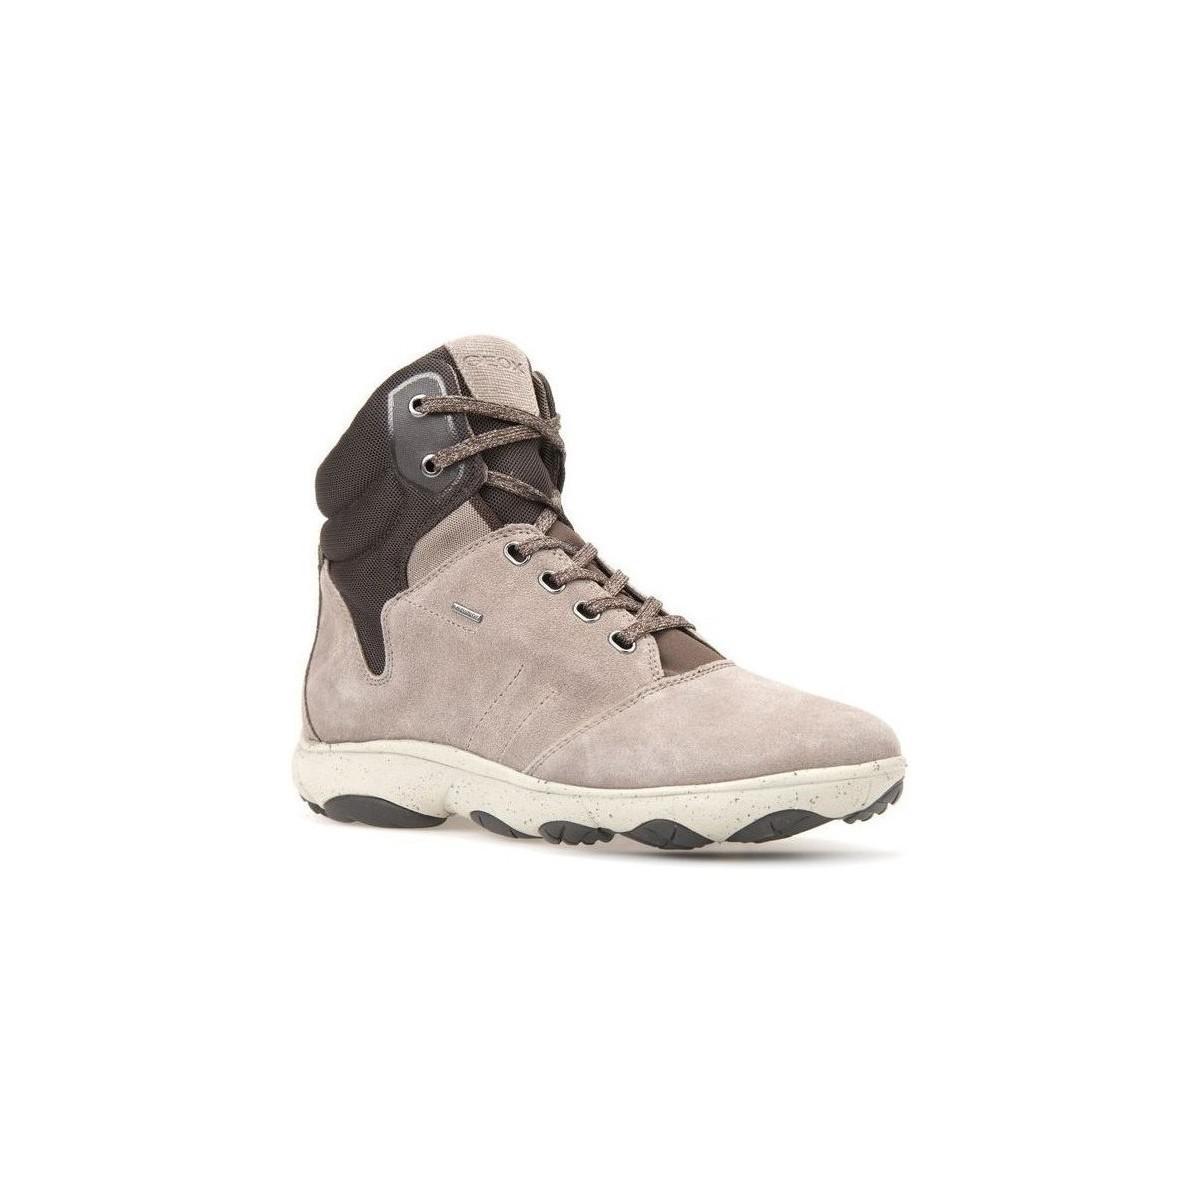 d7b3ae9042971 Geox D Nebula 4x4 B Abx A Women's Shoes (high-top Trainers) In Beige ...